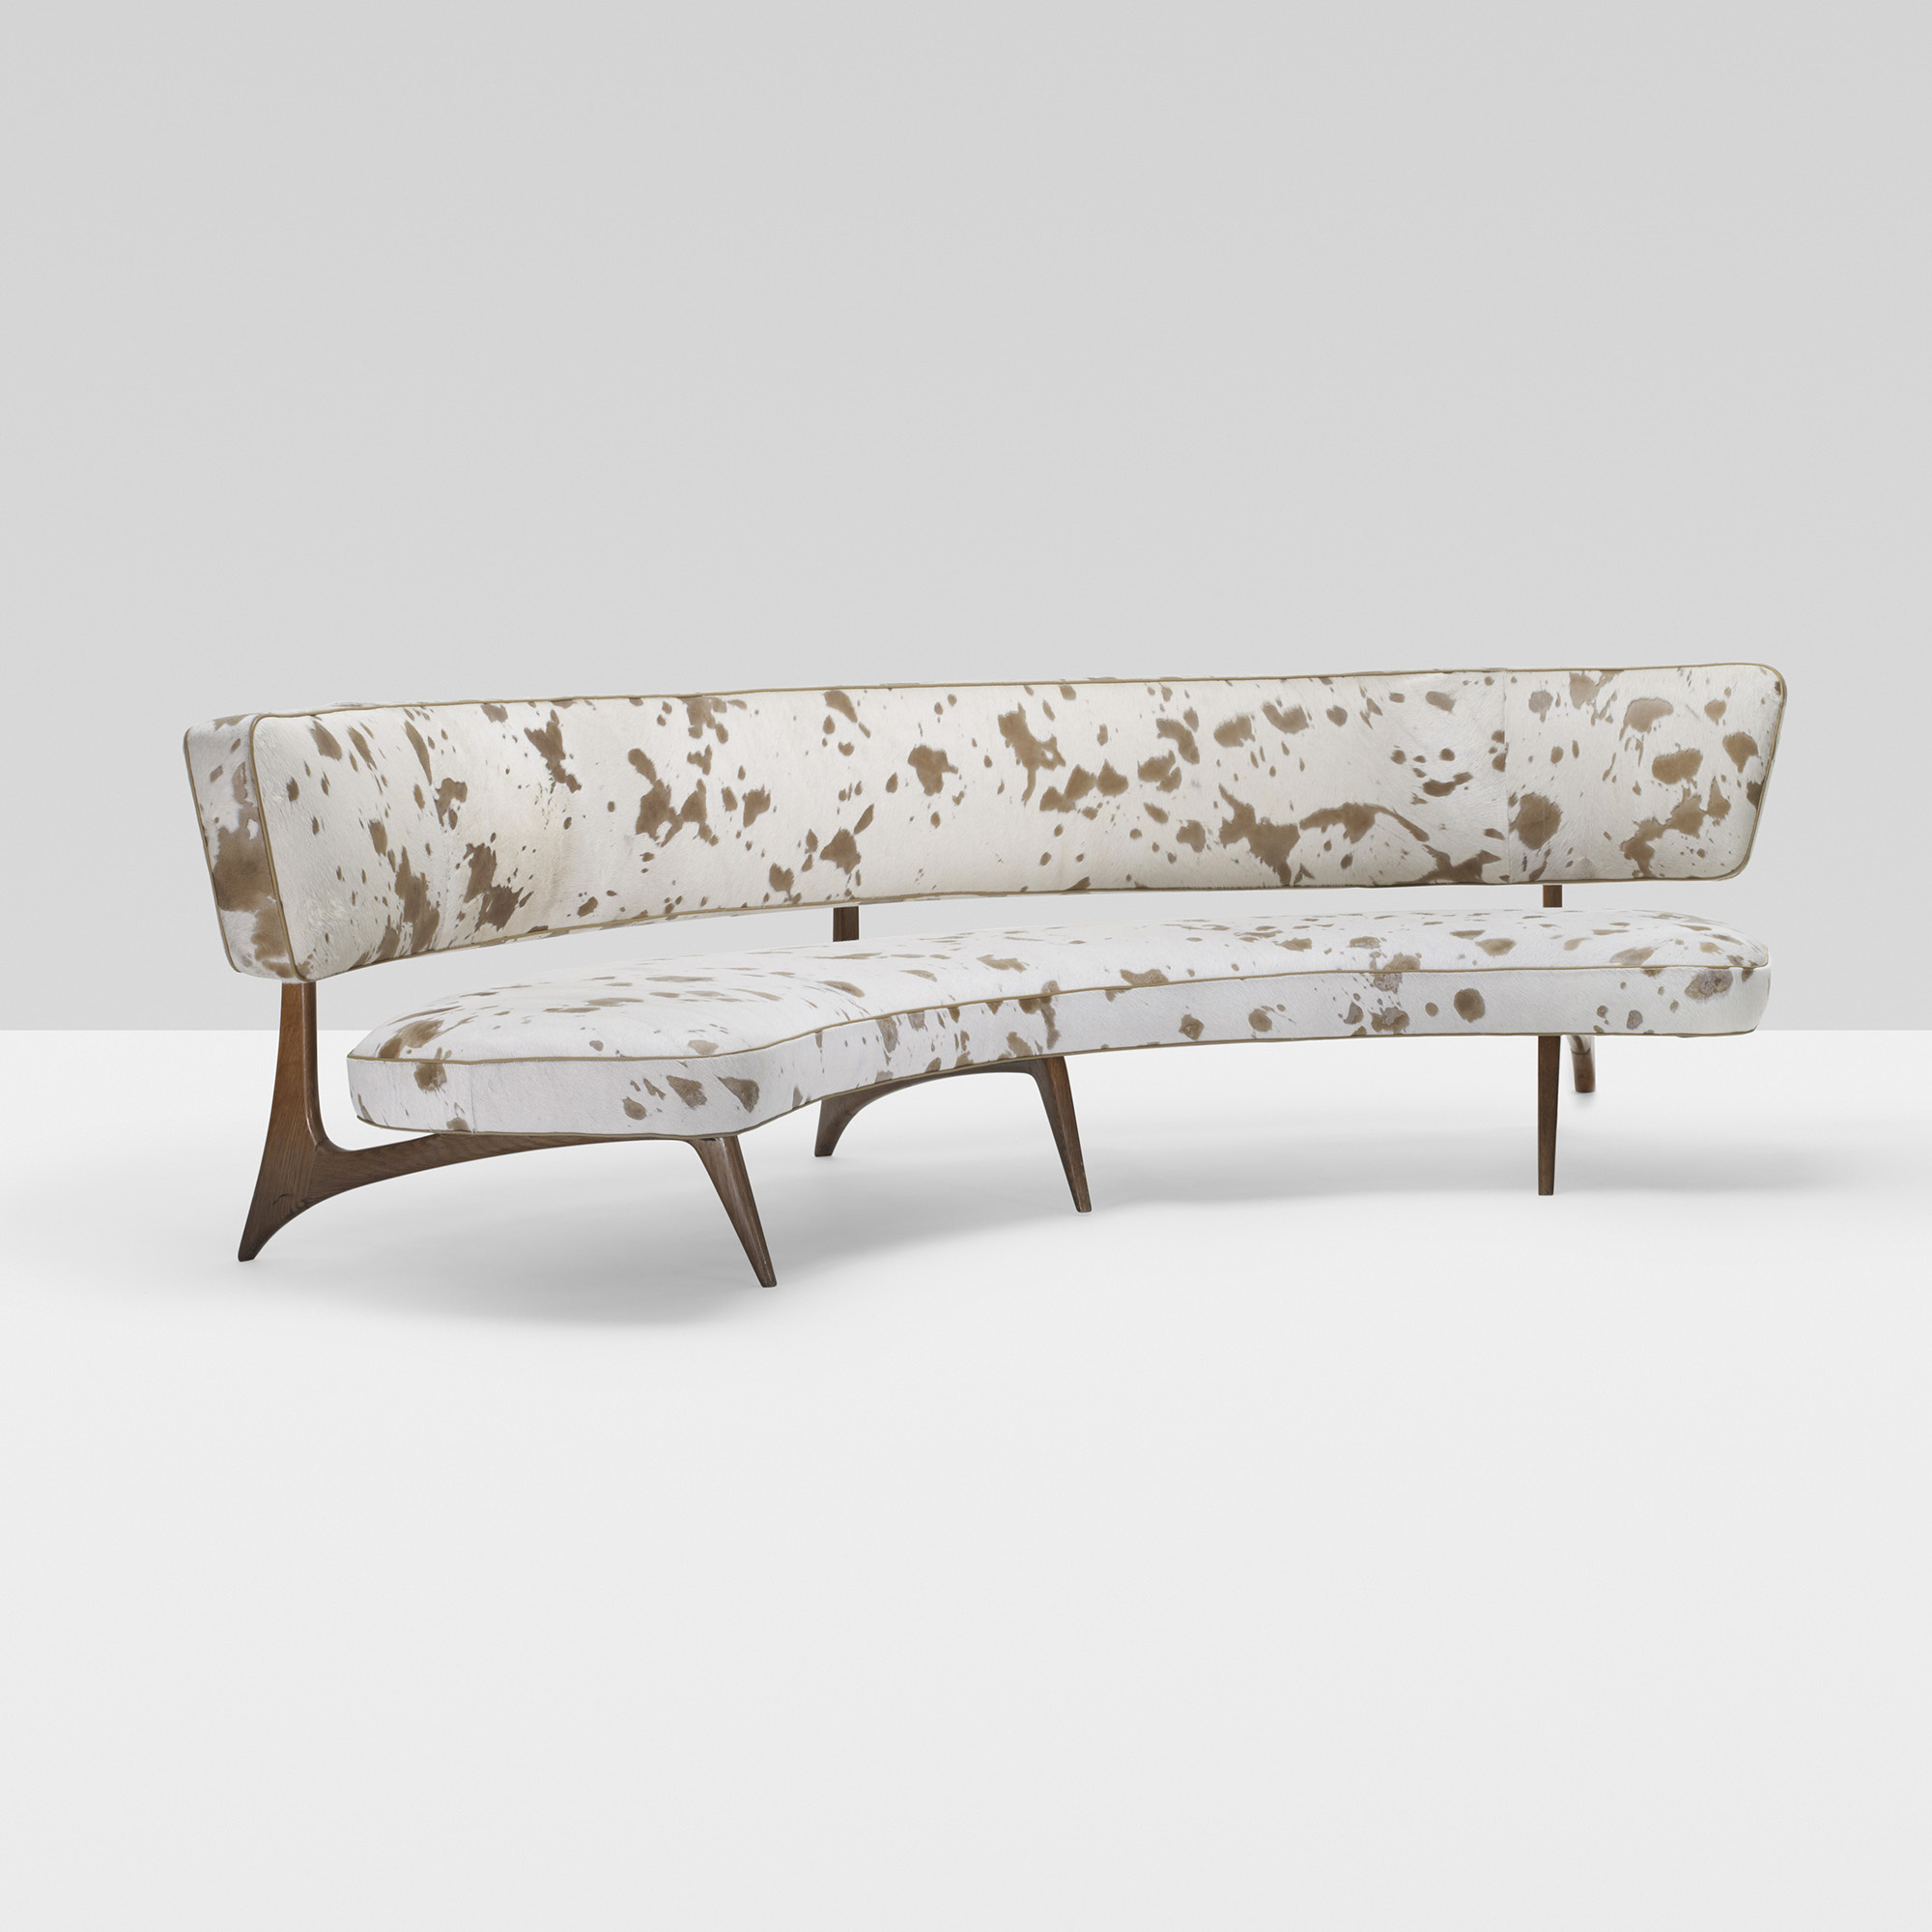 397: Vladimir Kagan / Floating Curve Sofa (1 Of 4)